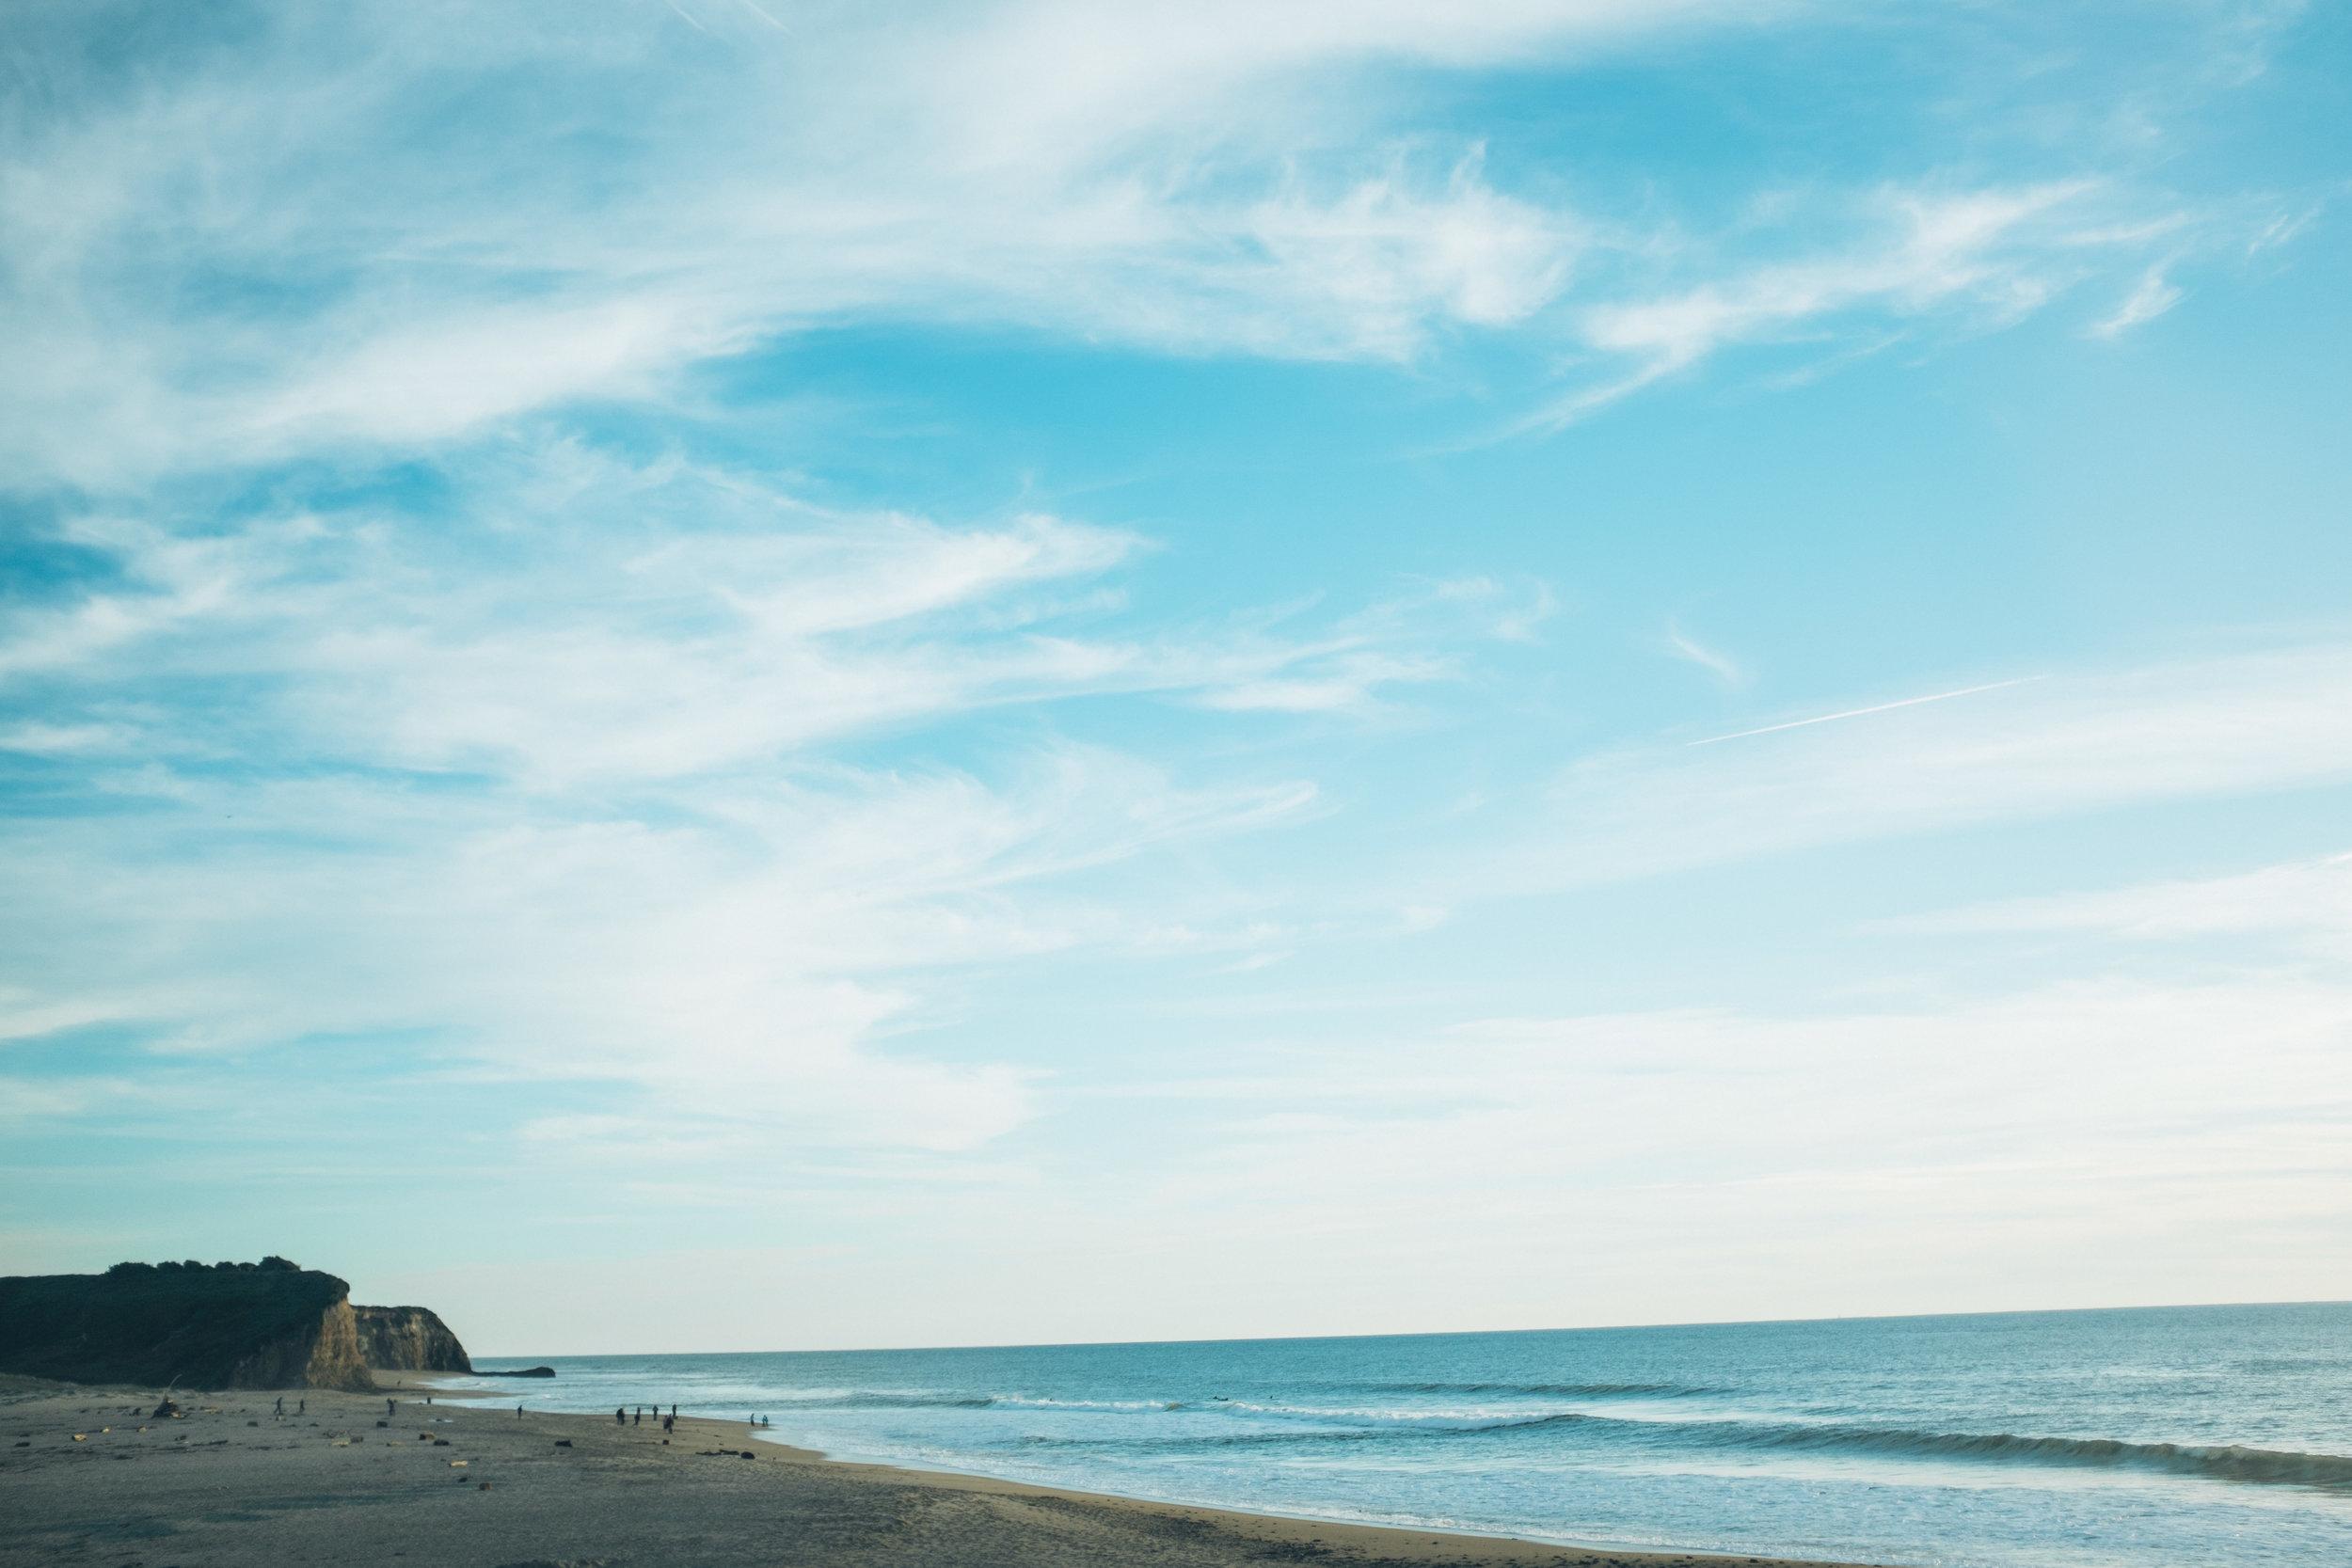 Hwy1 Beach California Toronto Travel Photographers - Suech and Beck